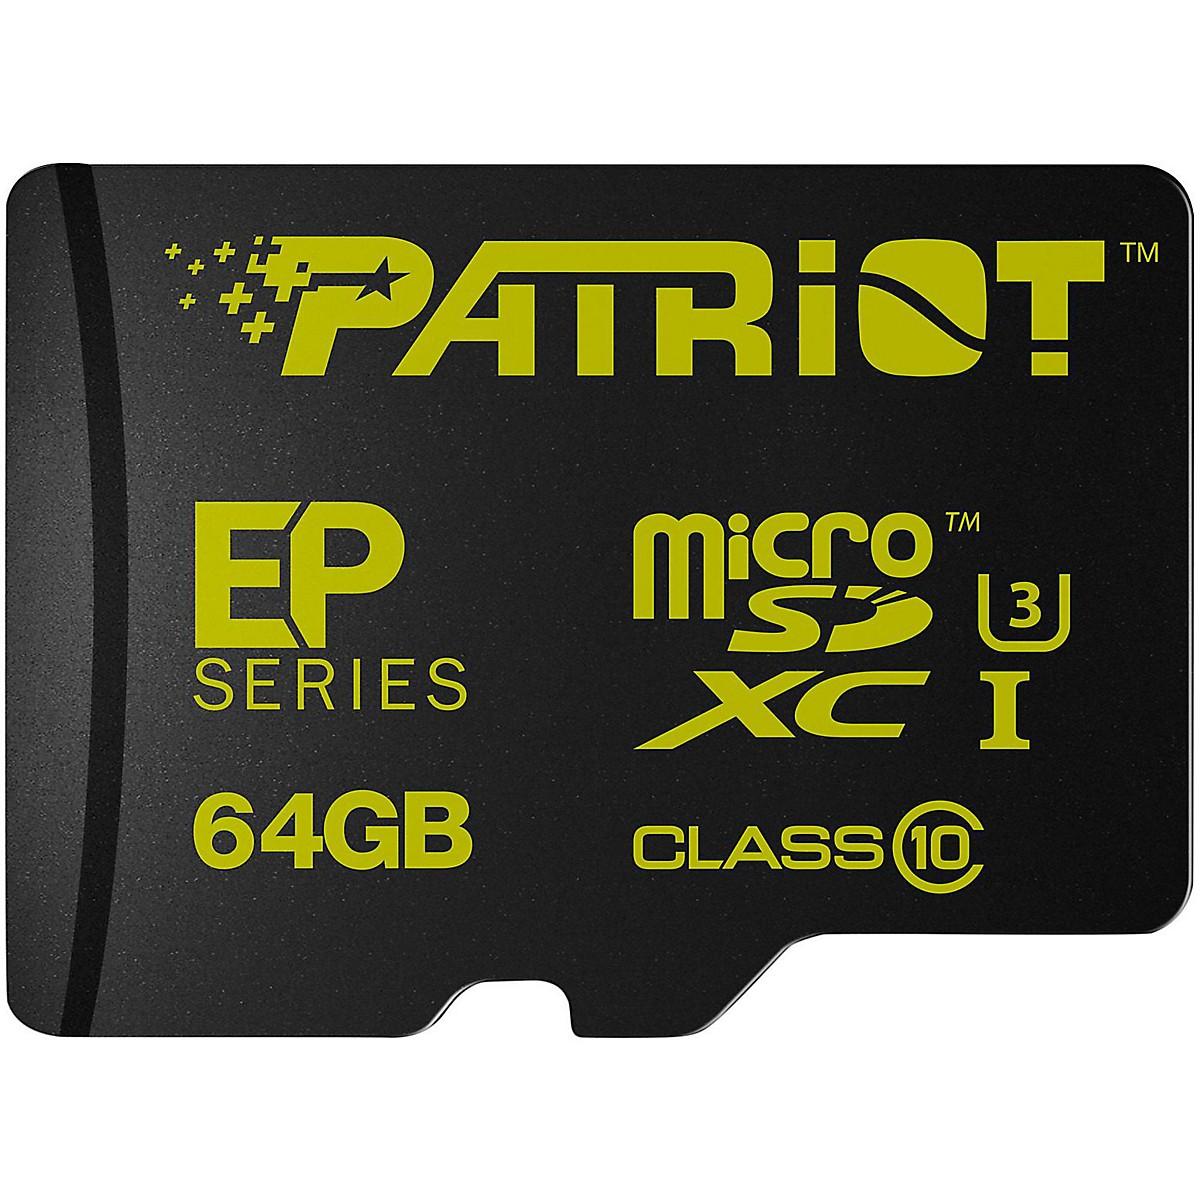 Patriot EP 64GB Series Flash microSDXC Class 10